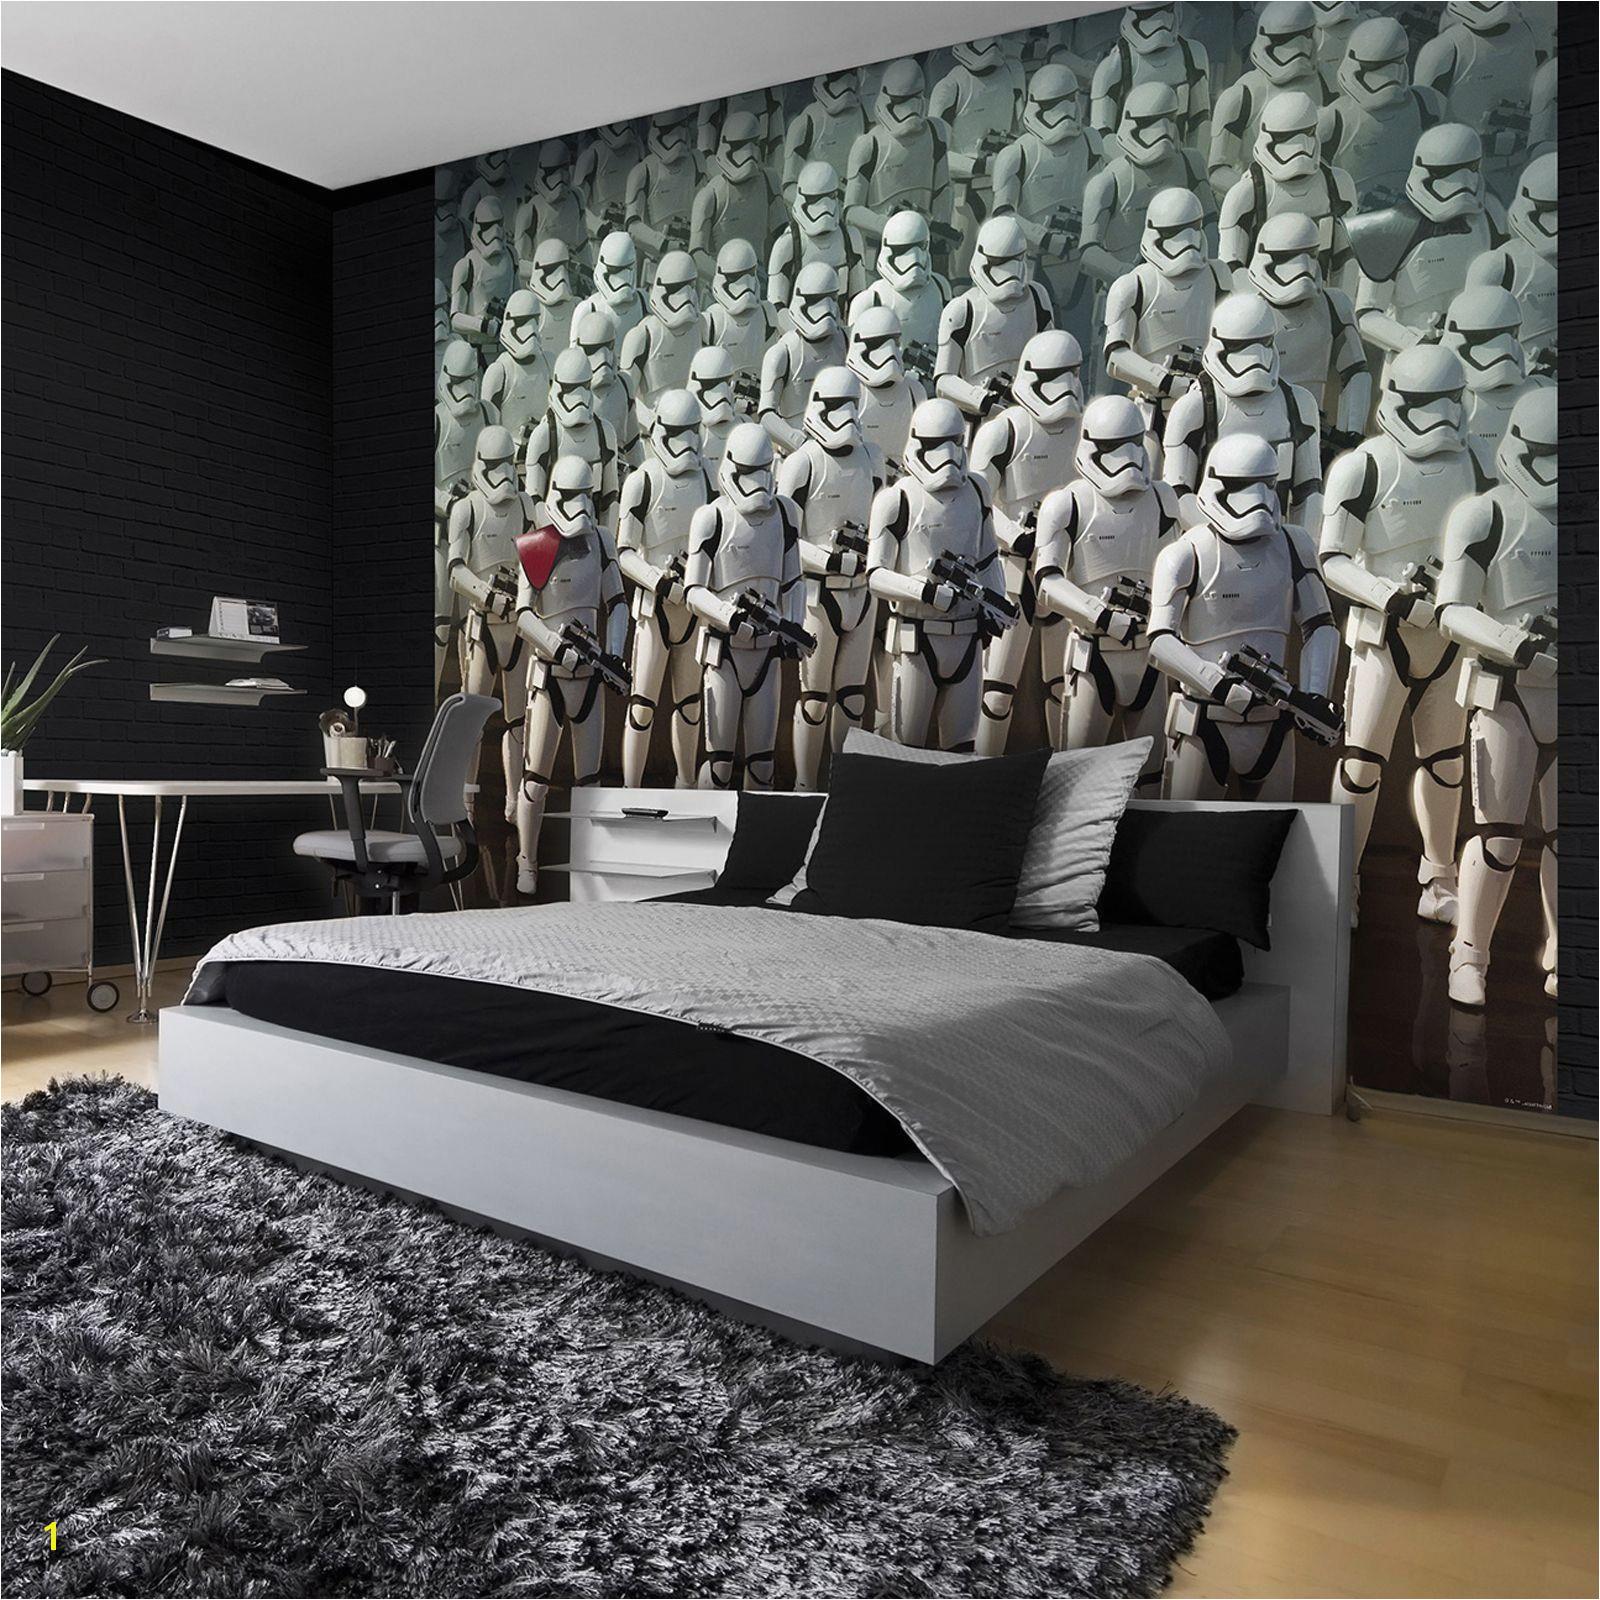 Disney Cars Wall Mural Full Wall Huge Star Wars Stormtrooper Wall Mural Dream Bedroom …